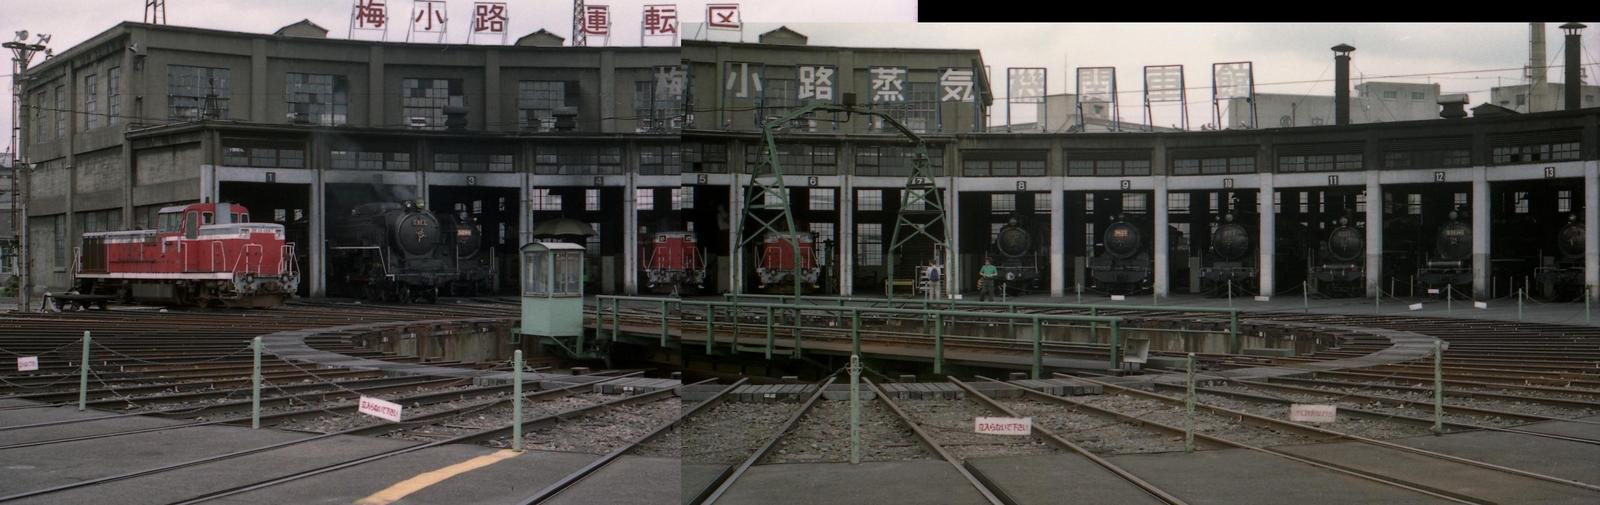 19920627a